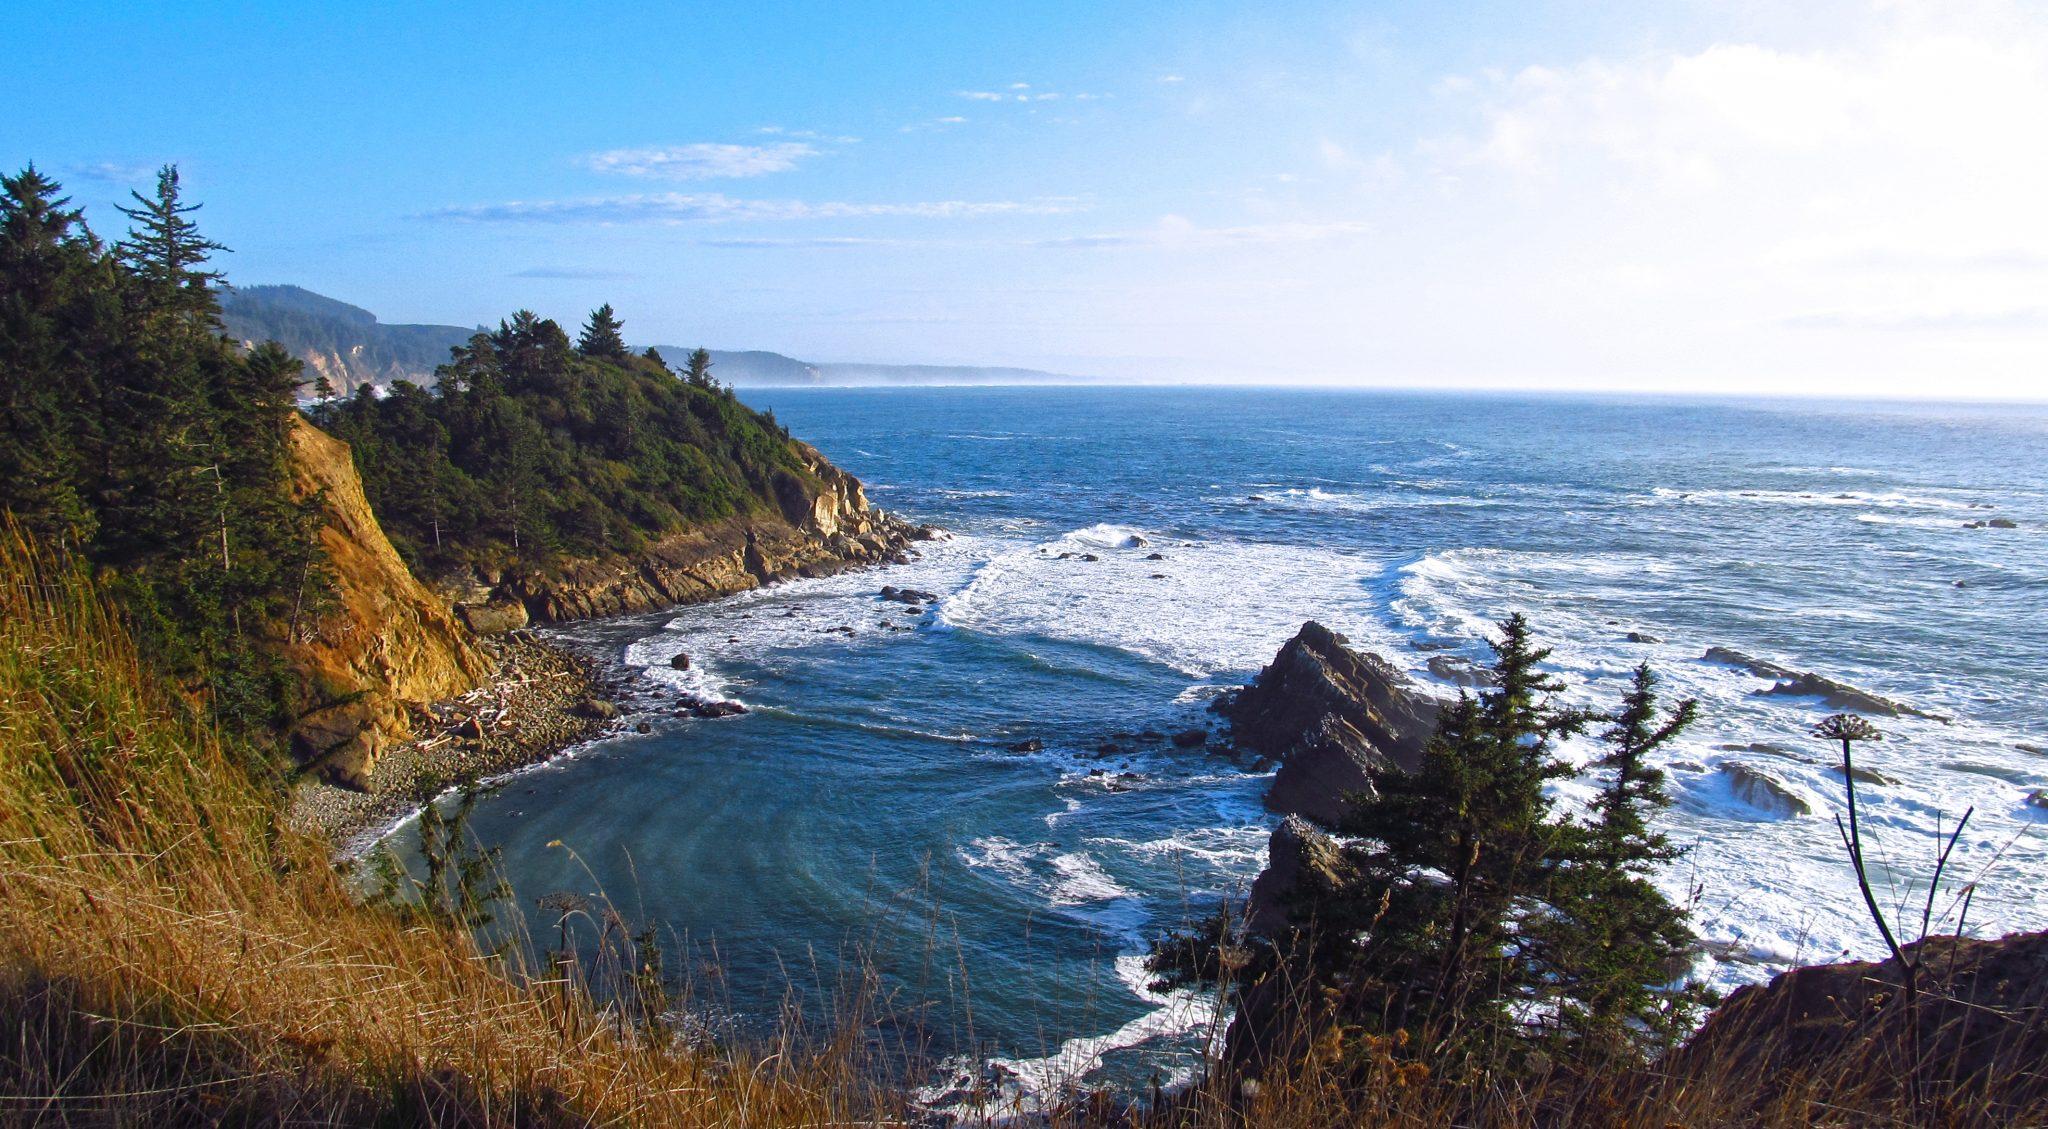 Gorgeous Cove Near Coos Bay, Oregon